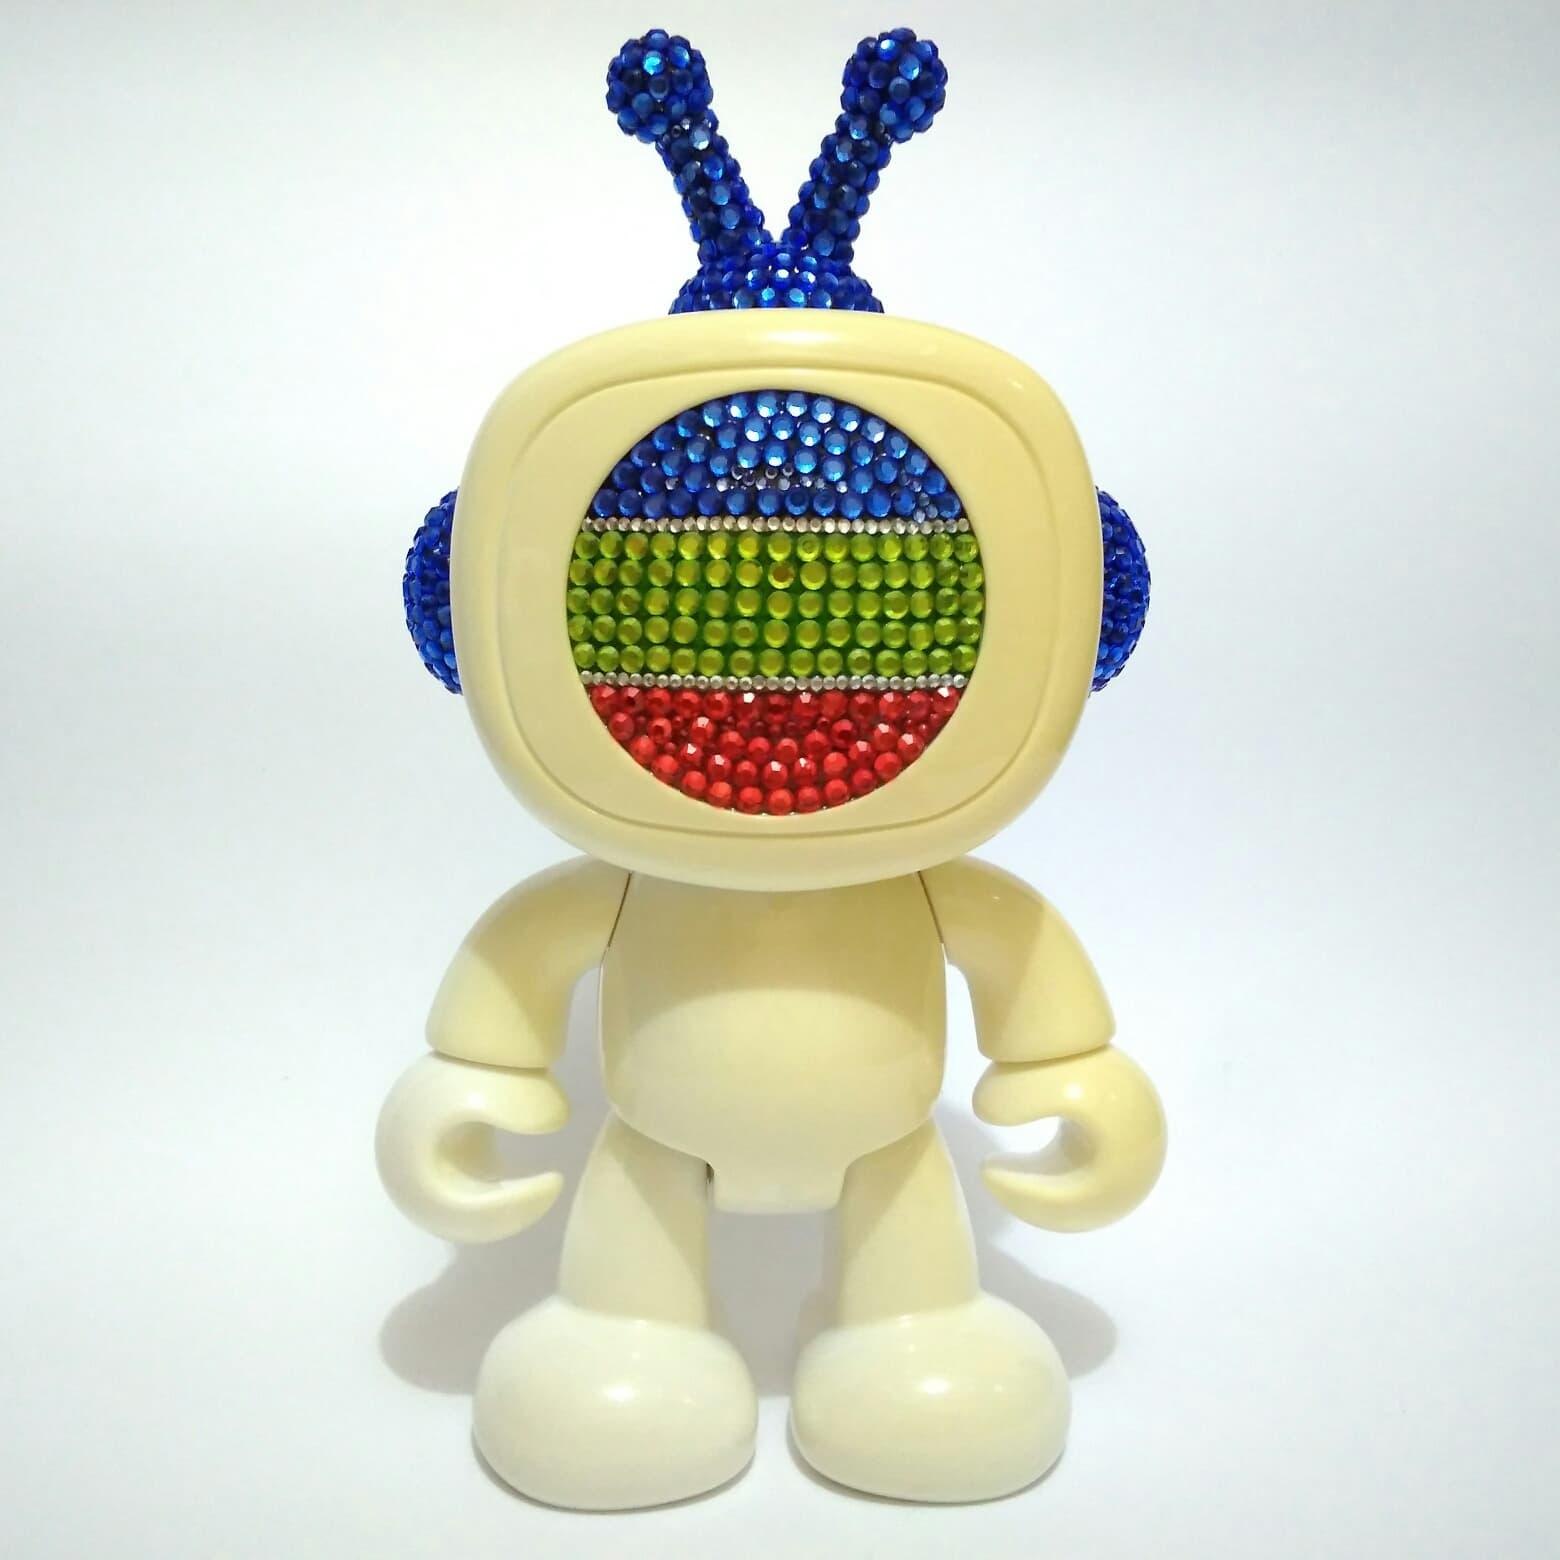 Jual TVB anywhere buddy limited edition 50 anniversary